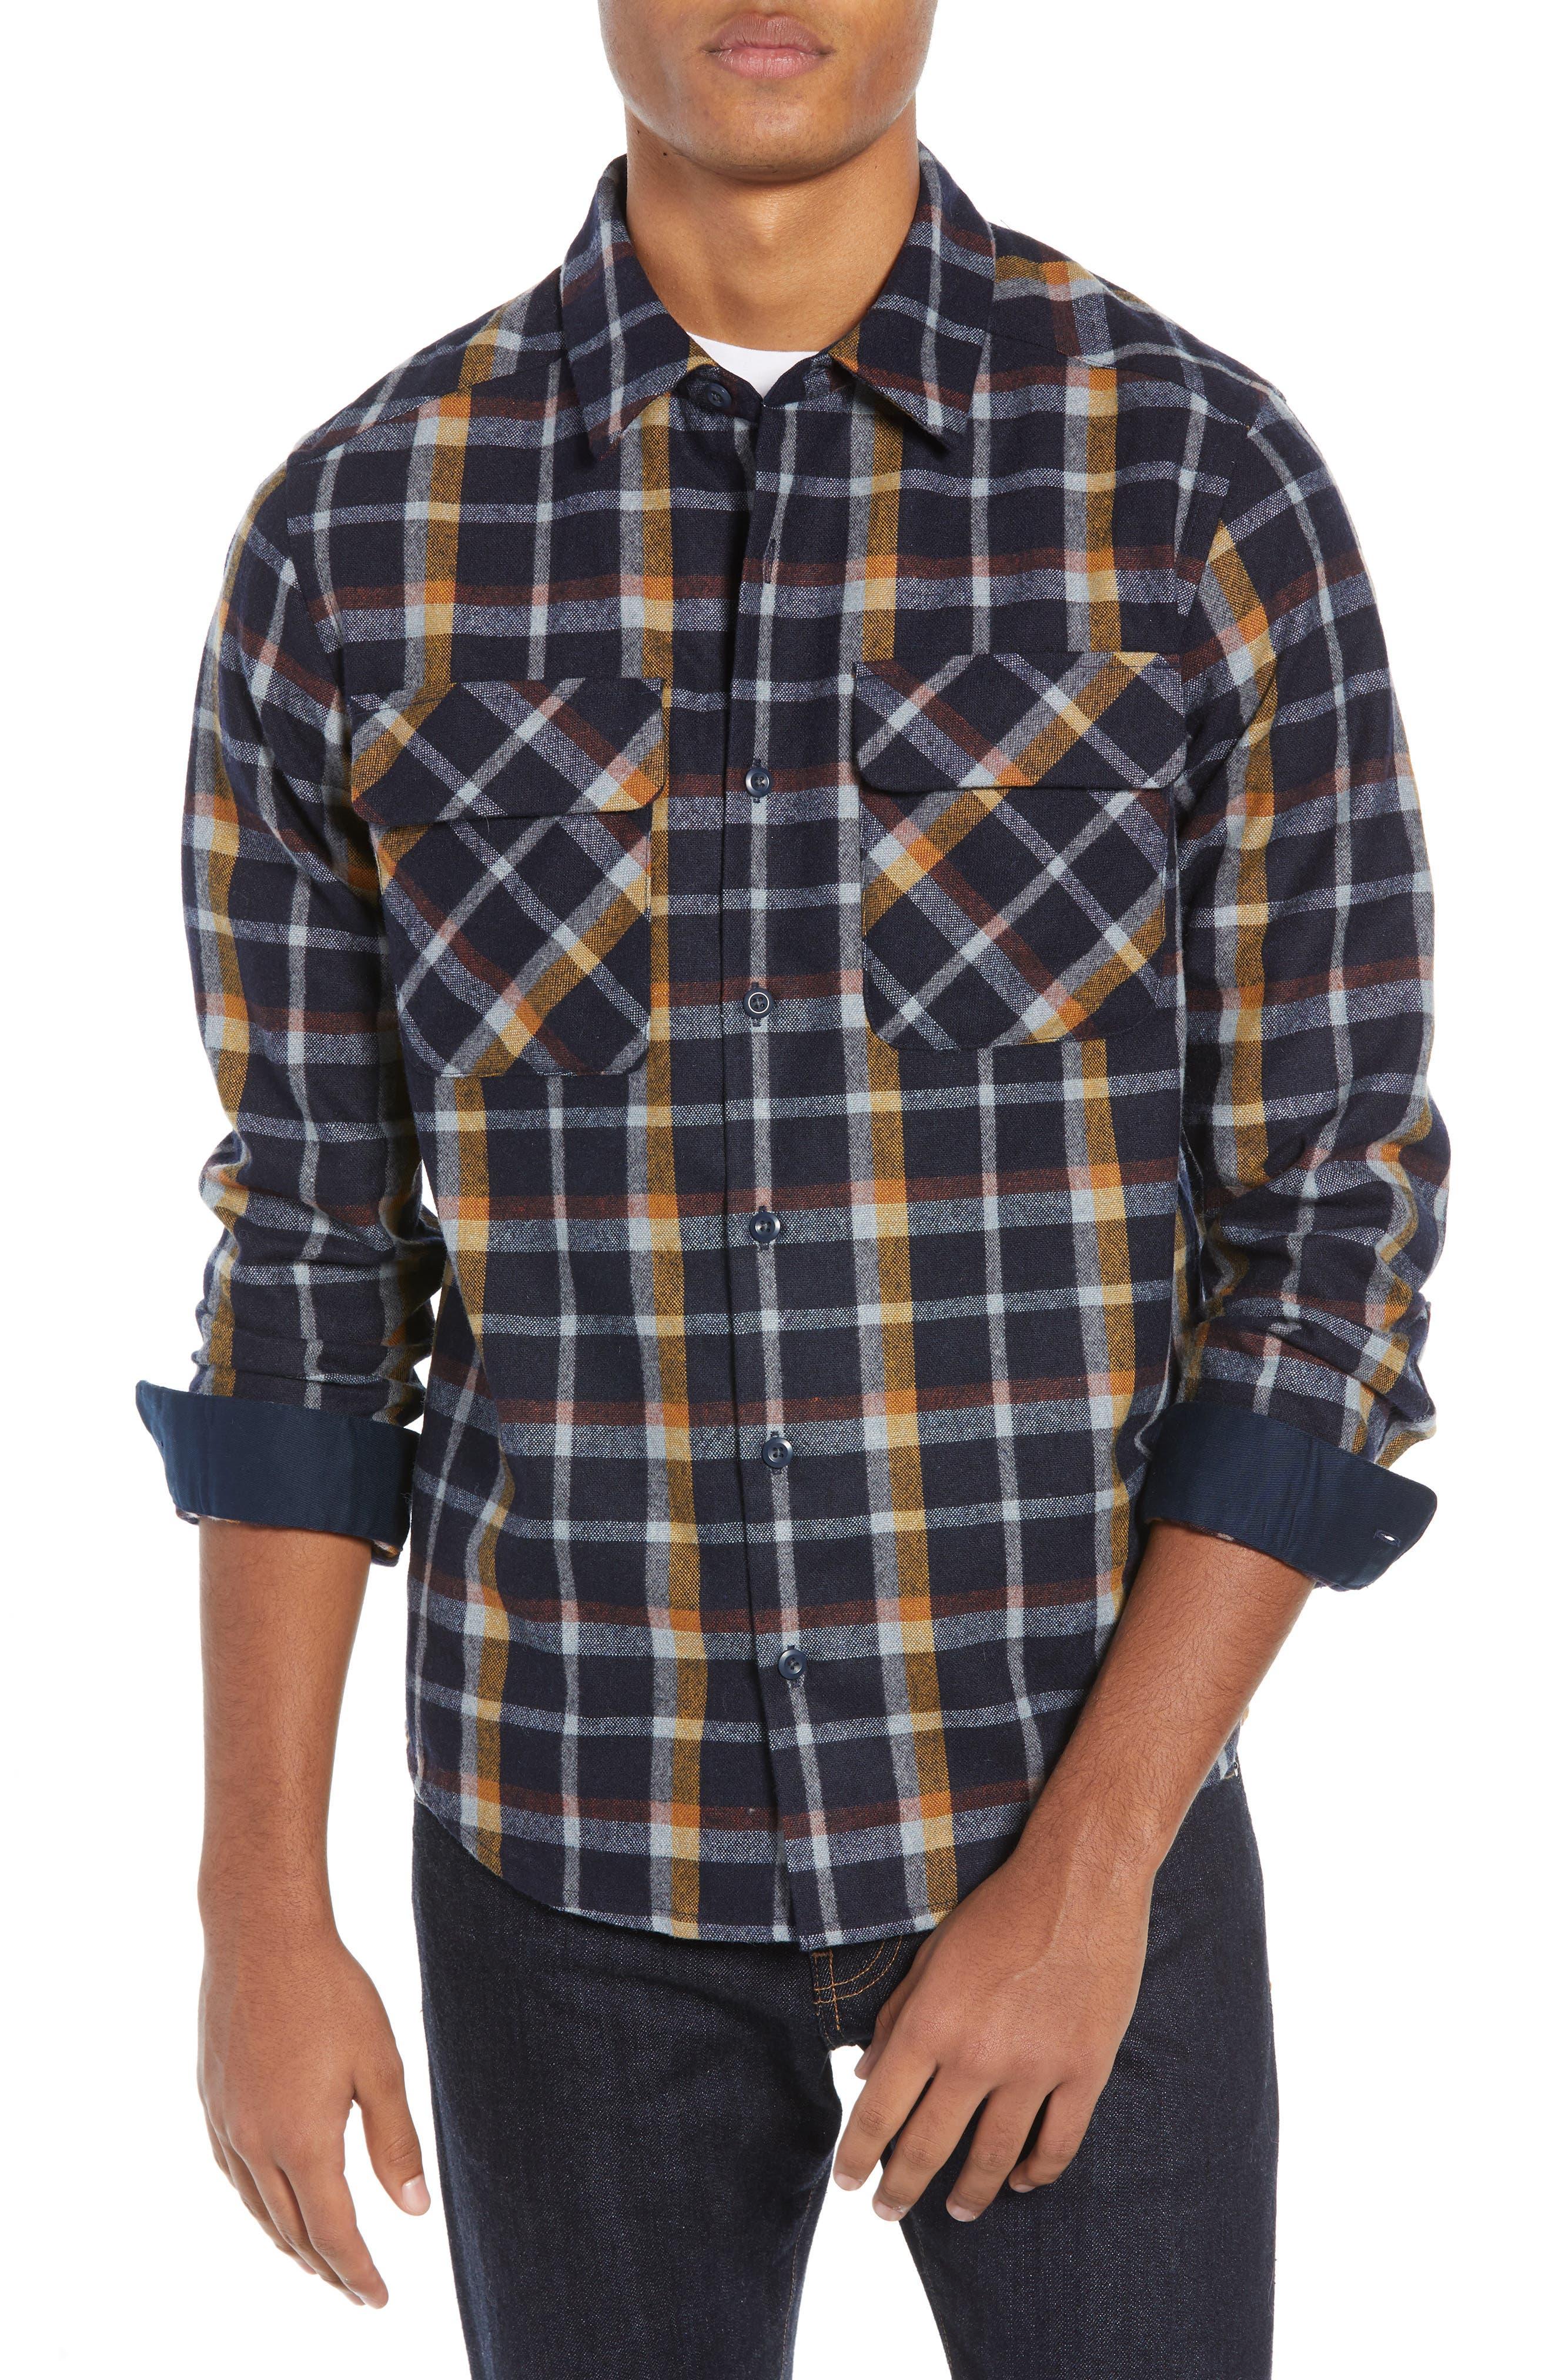 Recycled Wool Blend Shirt,                             Main thumbnail 1, color,                             REBEL PLAID/ NAVY BLUE